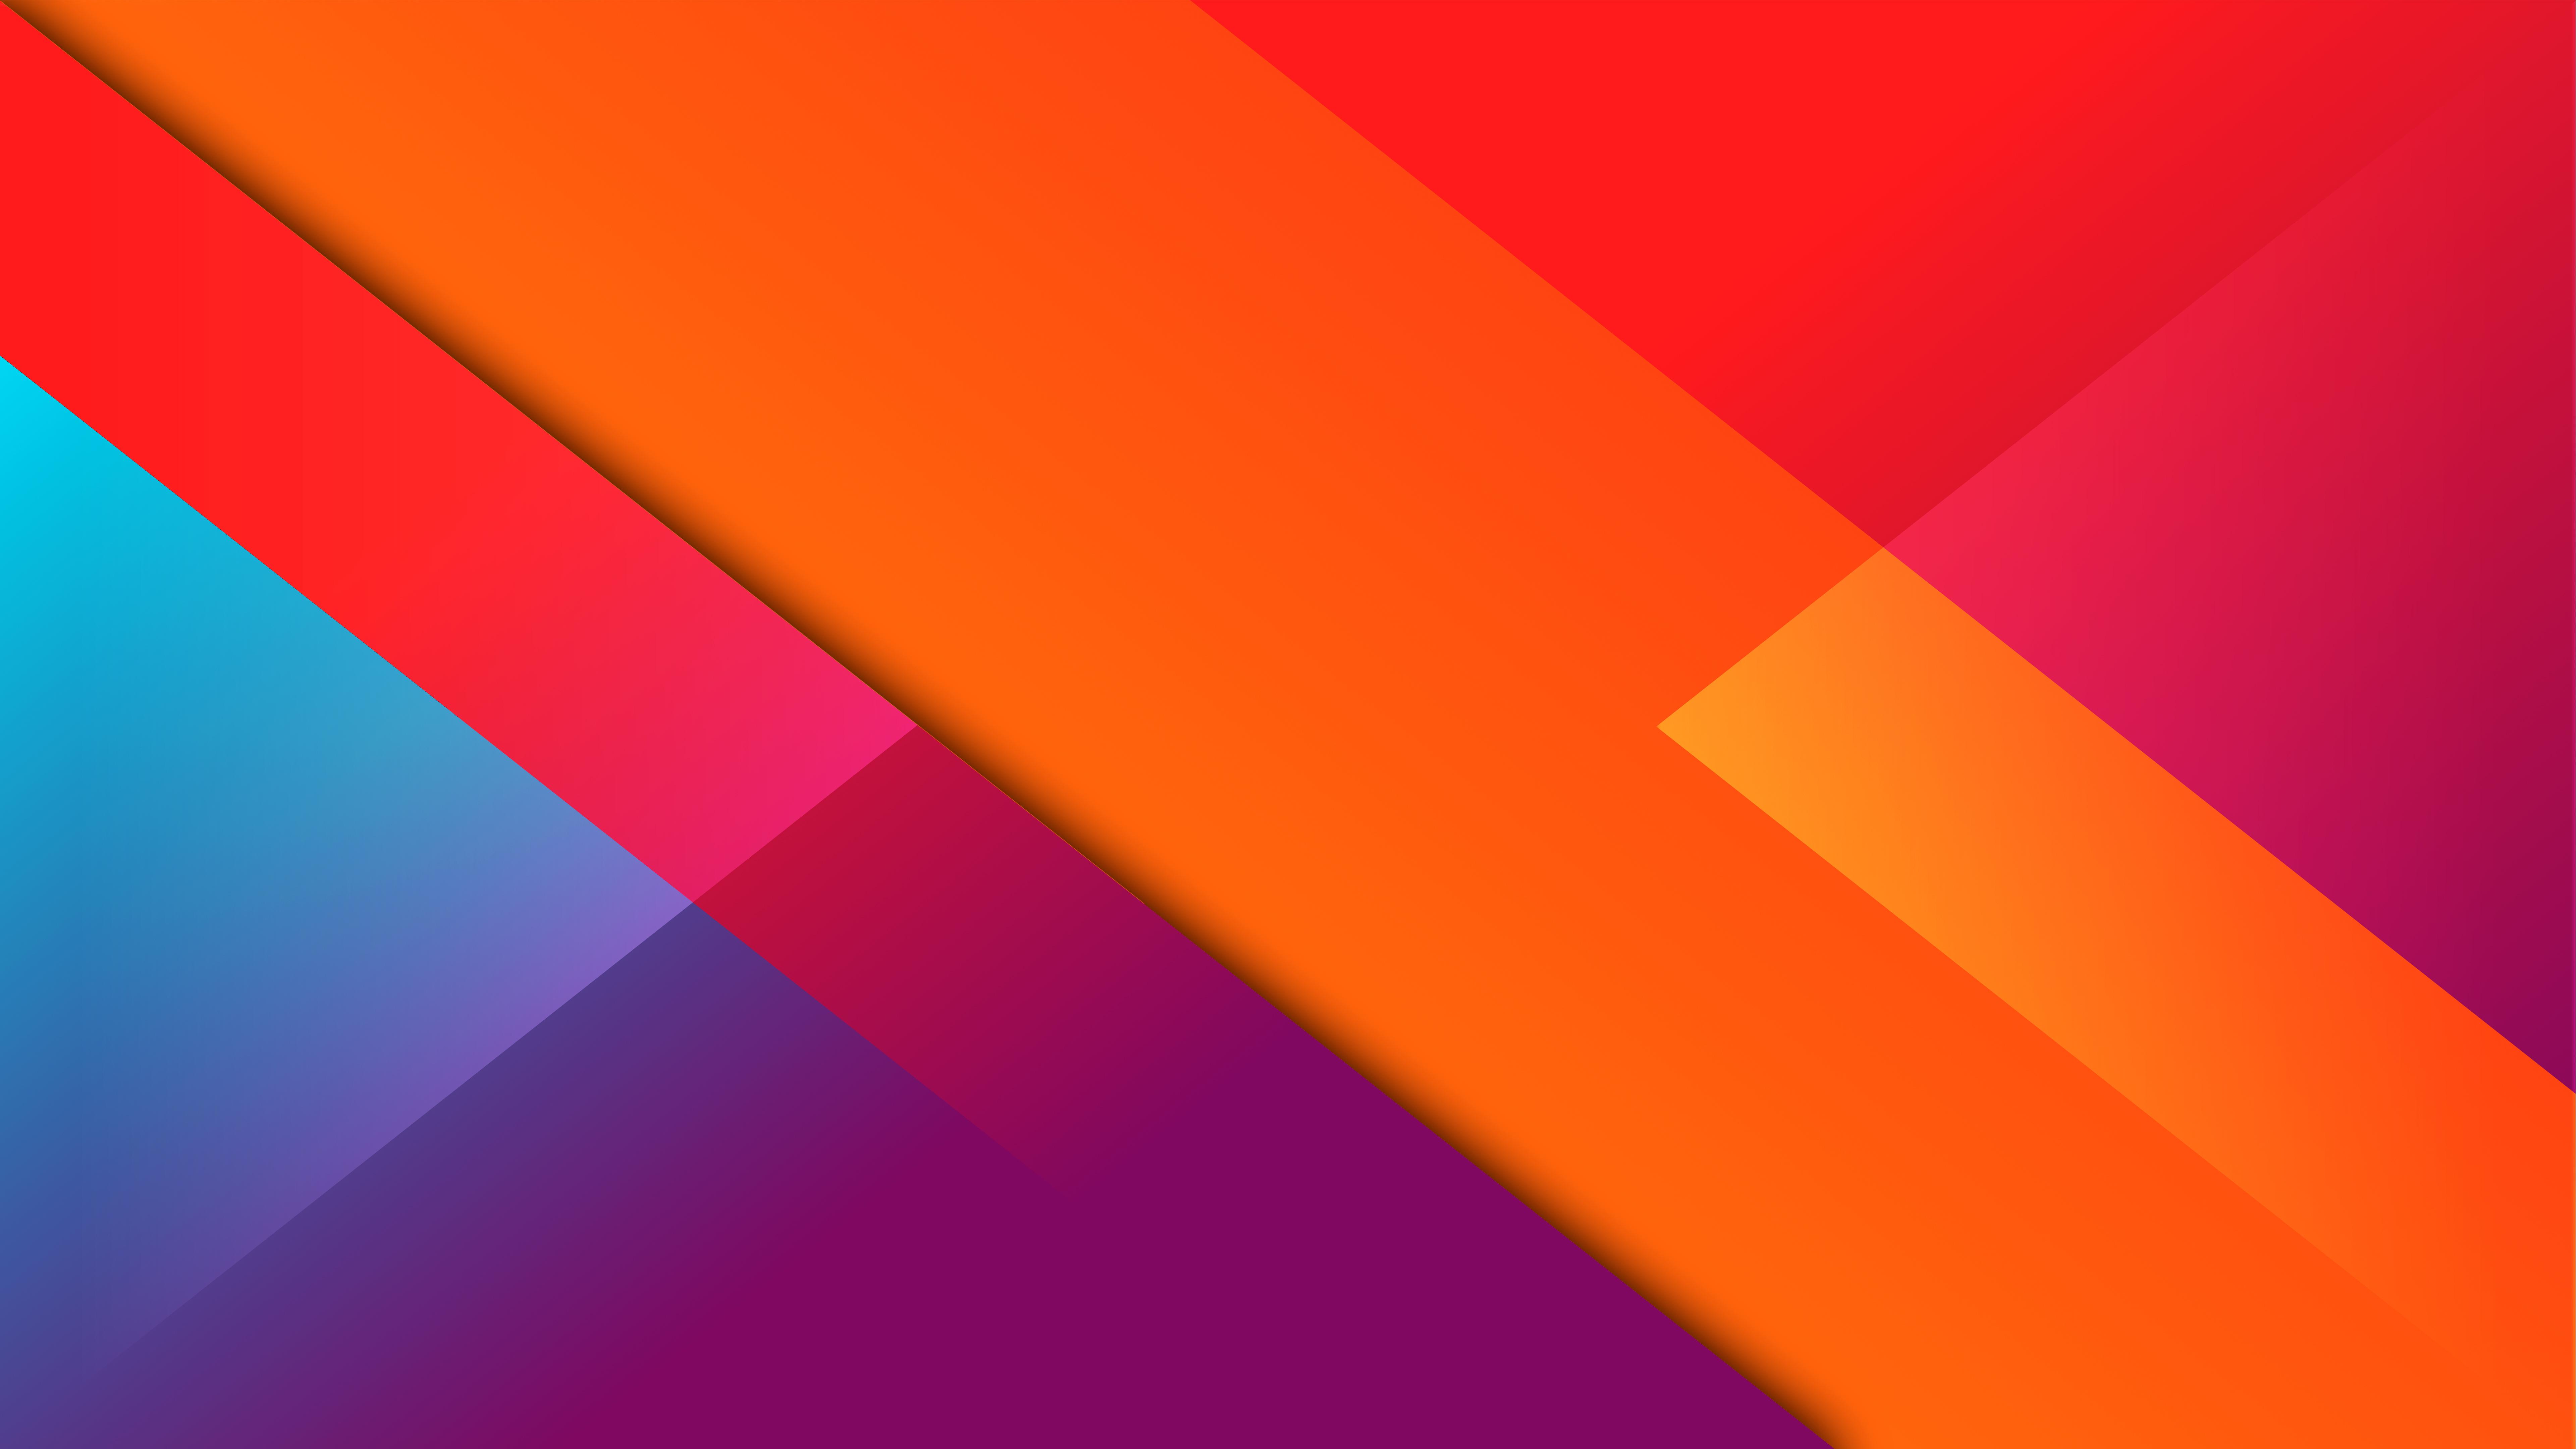 material colors 4k 1634163652 - Material Colors 4k - Material Colors wallpapers, Material Colors 4k wallpapers